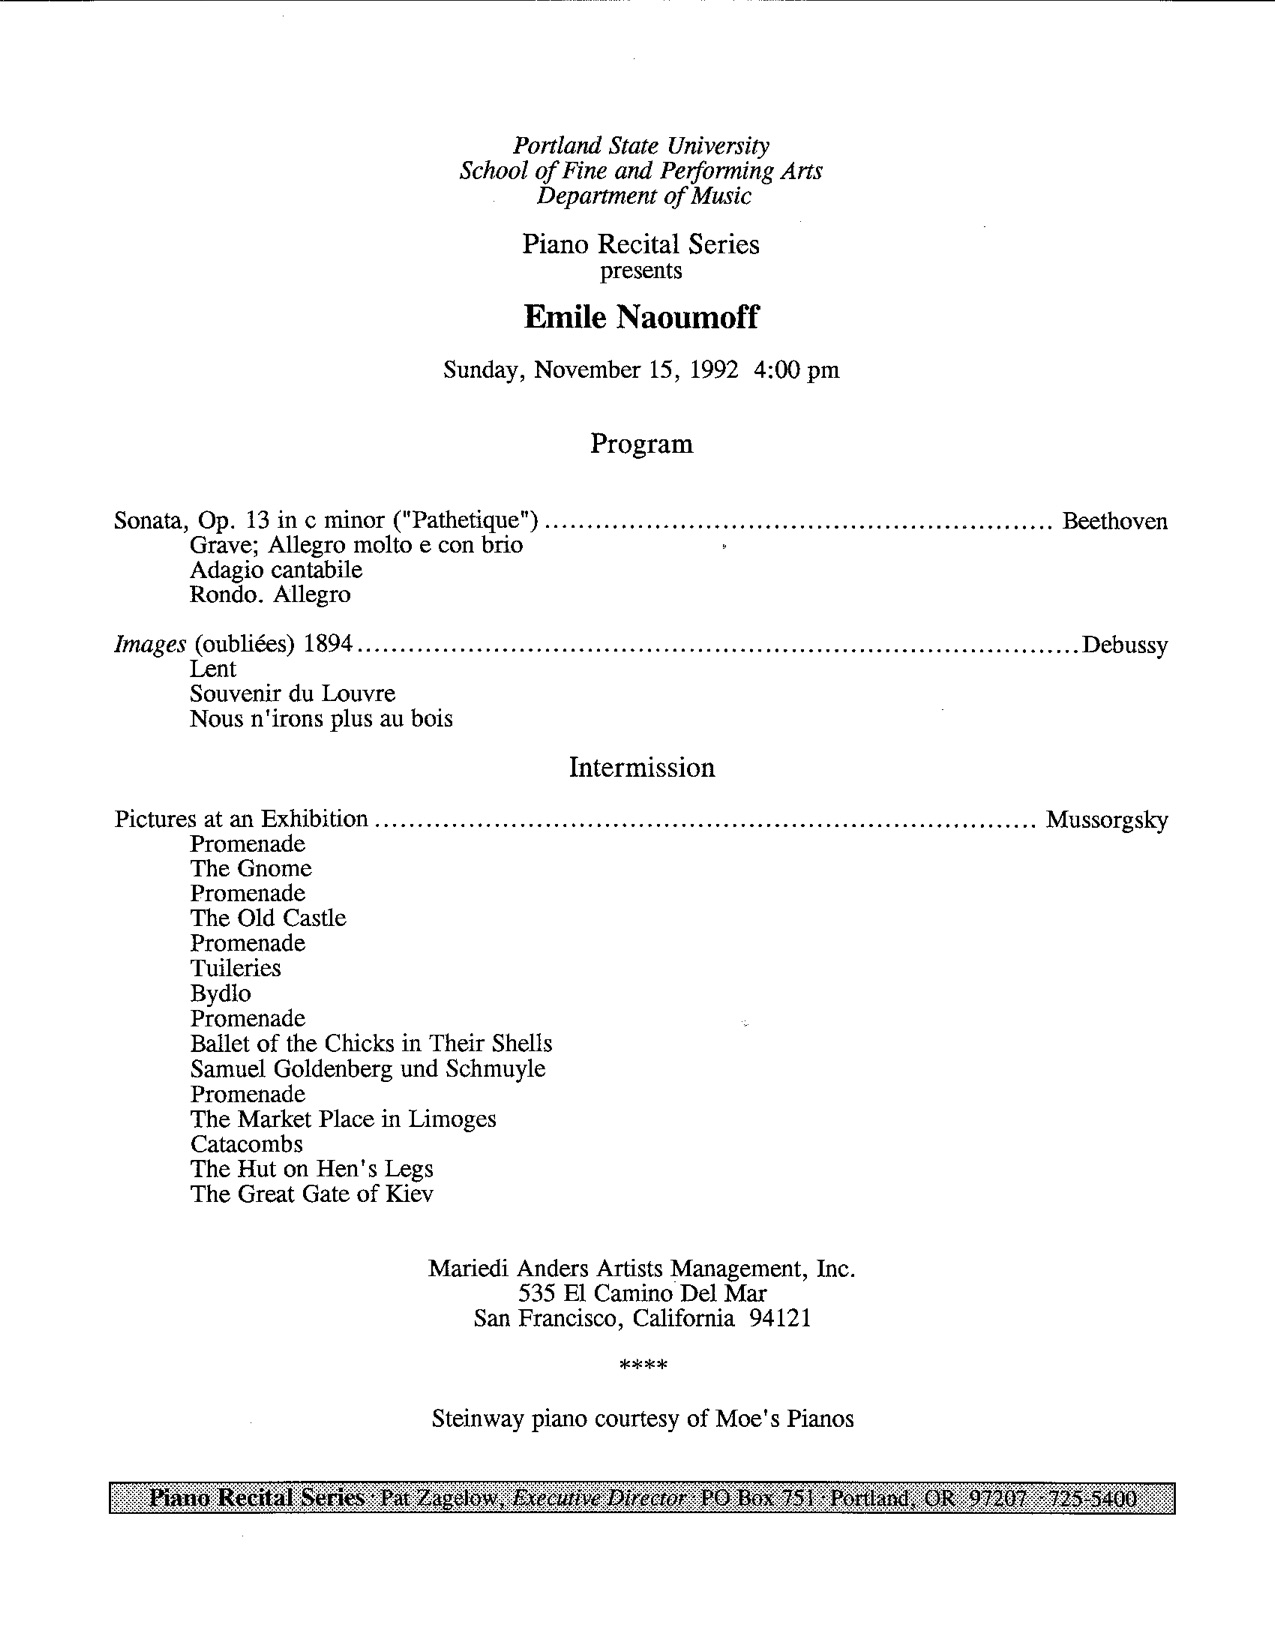 Naoumoff92-93_Program2.jpg